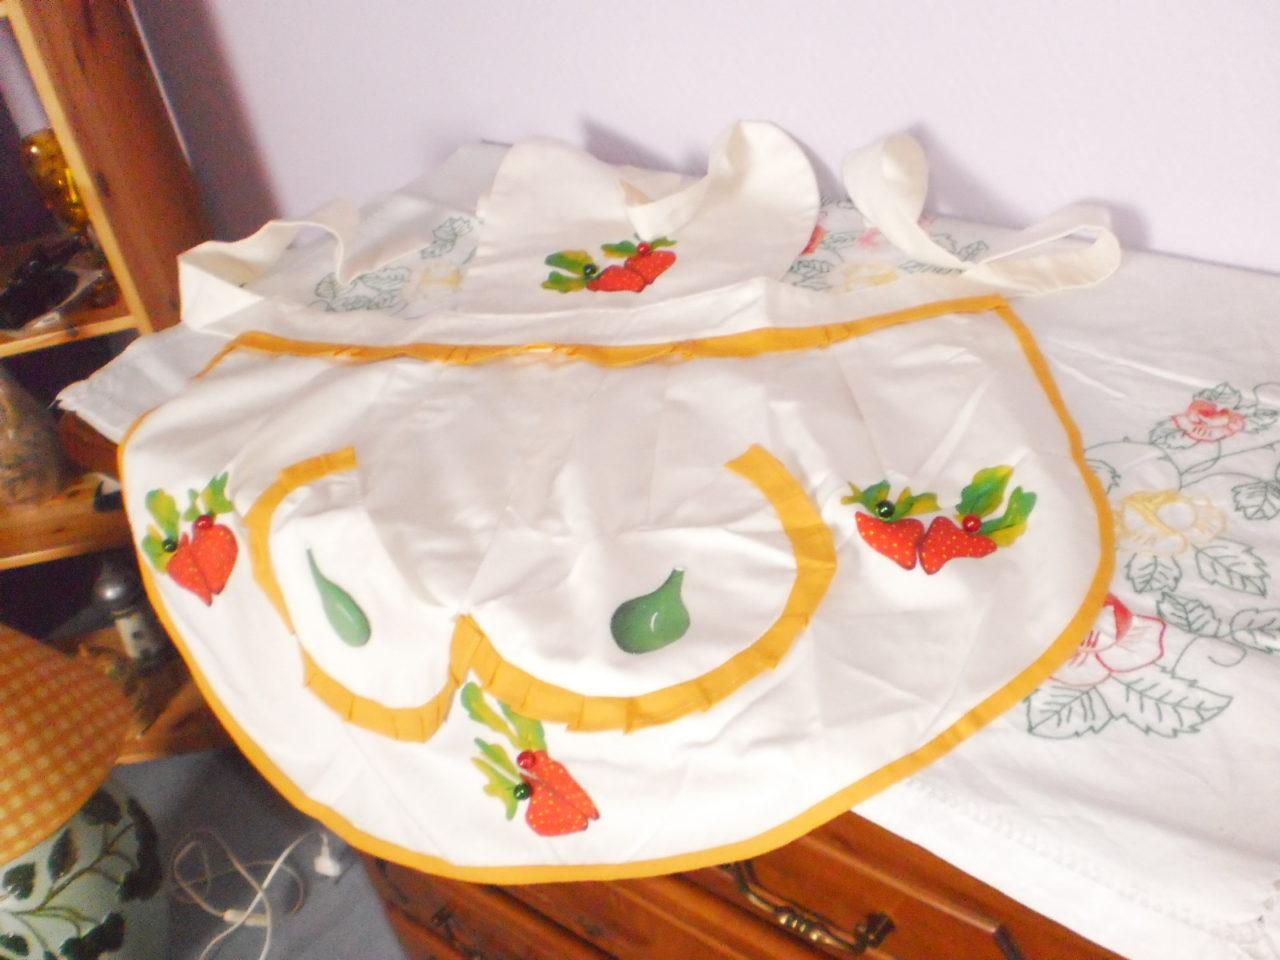 recherche usine confection tunisie maroc turquie inde nous